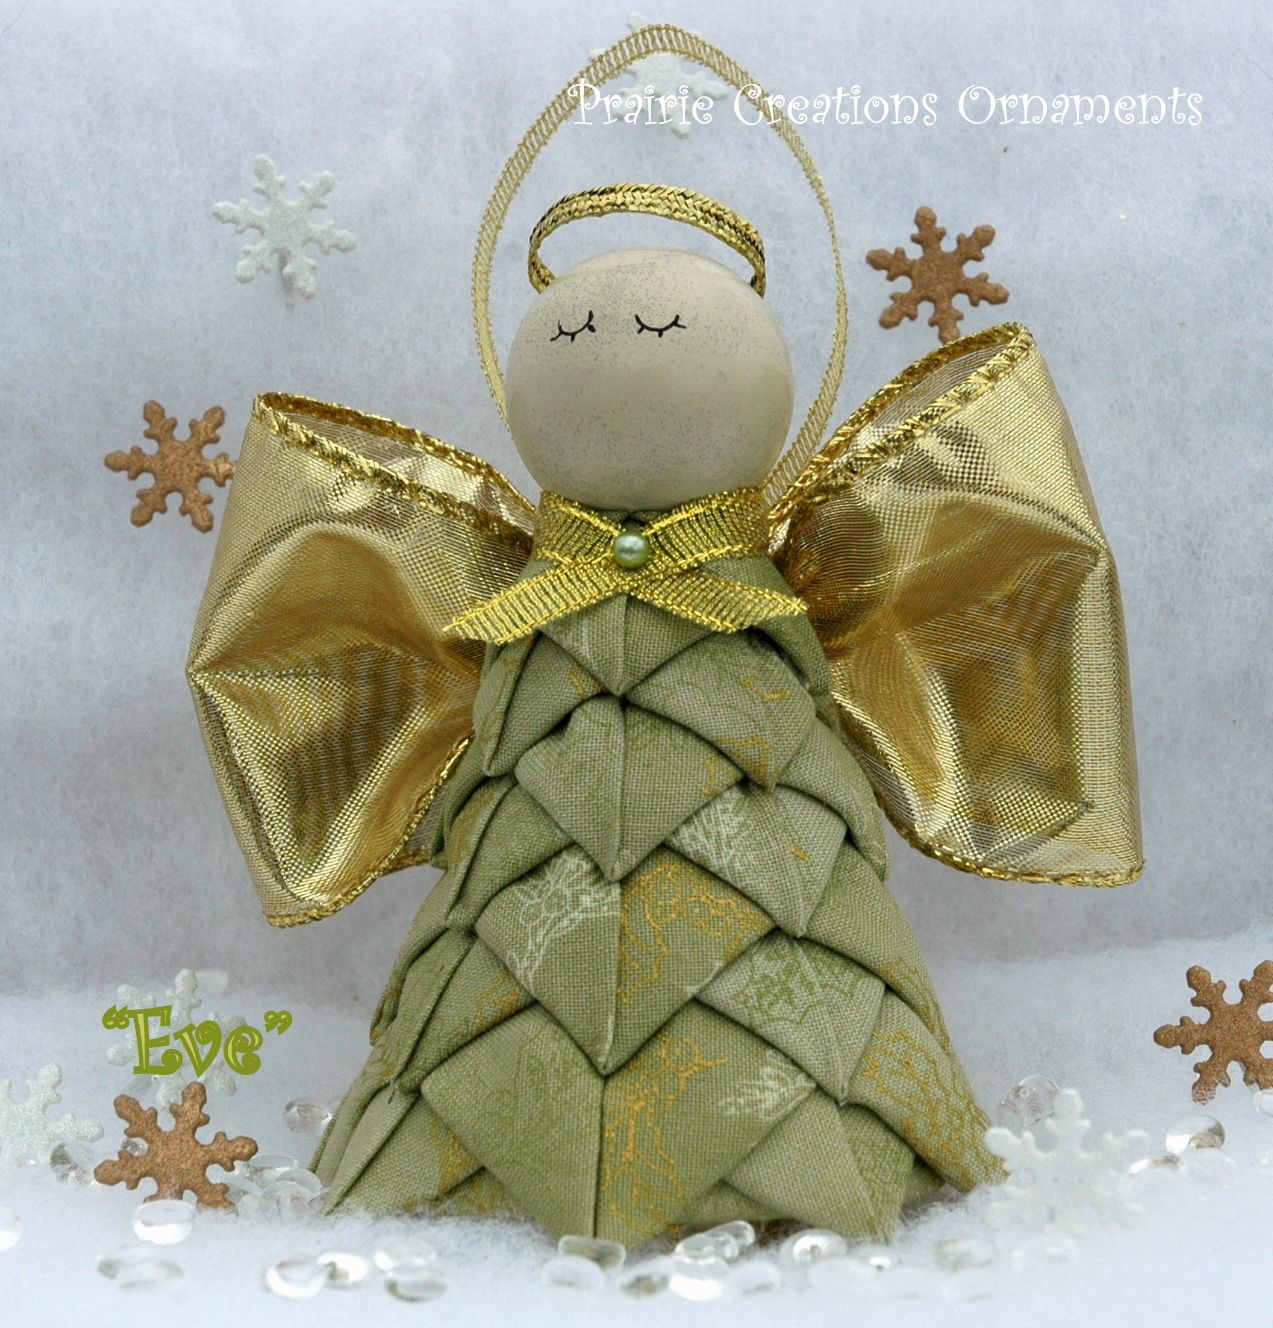 Christmas Angel Folded Fabric Ornament Kit Instructions Eve Fabric Christmas Ornaments Folded Fabric Ornaments Quilted Christmas Ornaments